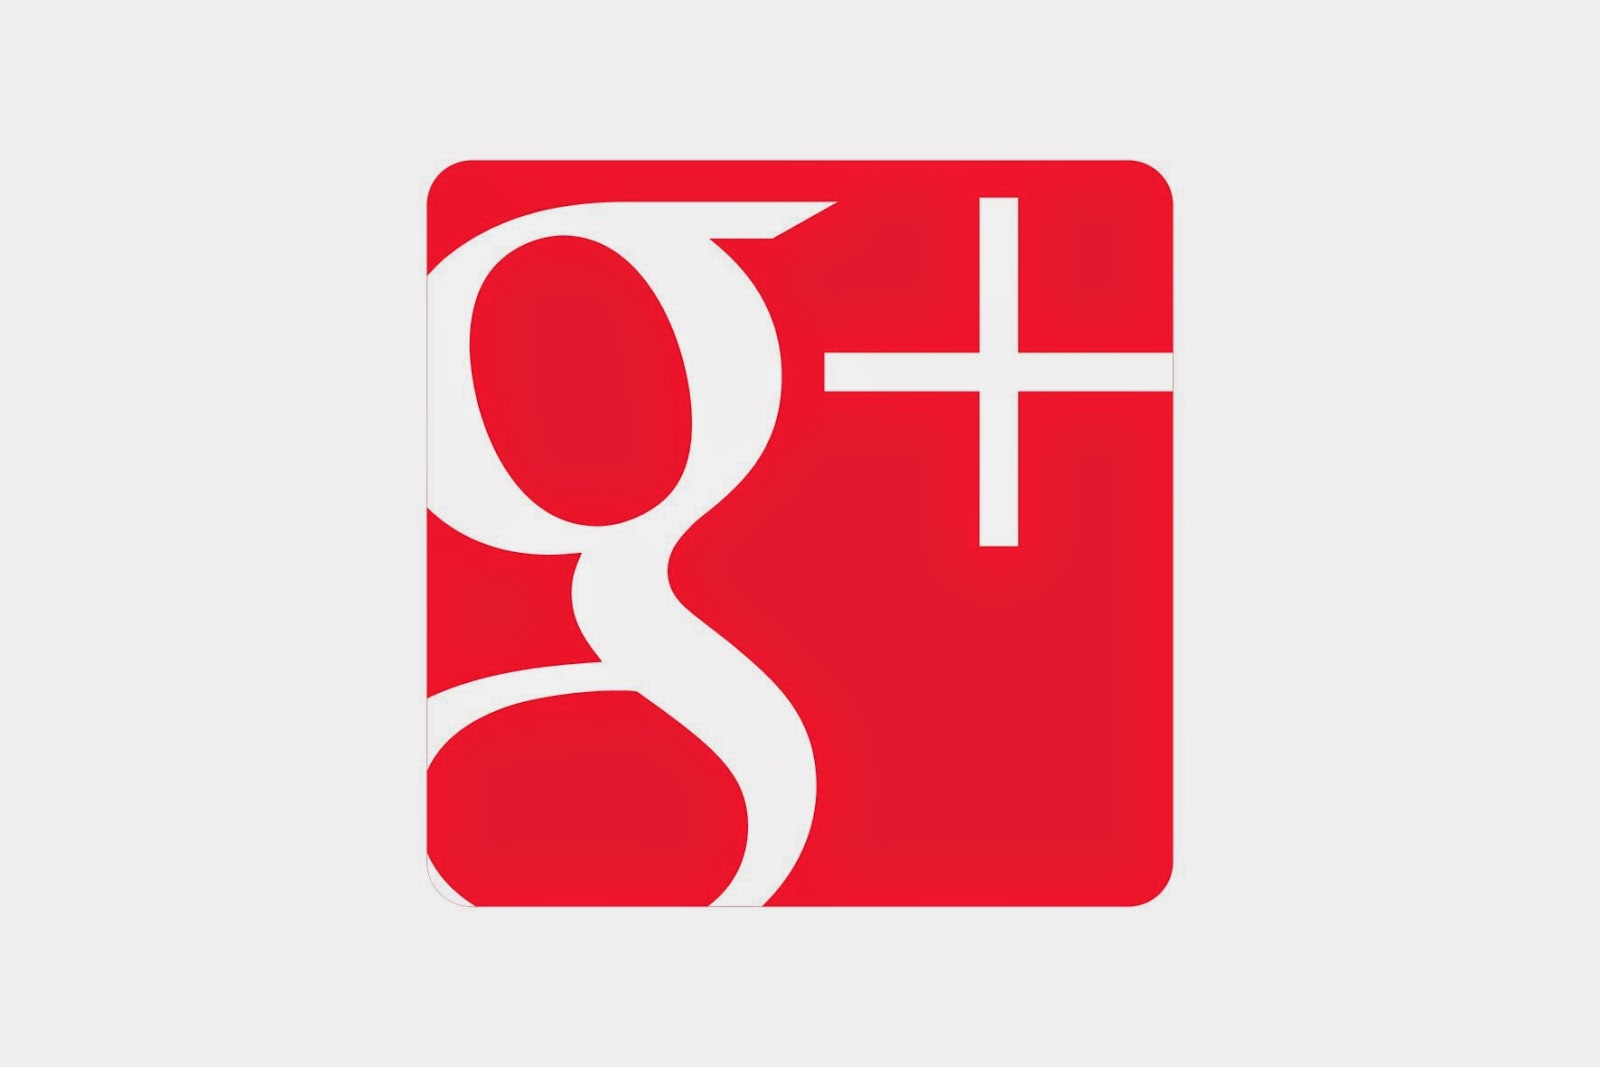 1600x1067 Google Google Plus Brands Of The Download Vector Logos